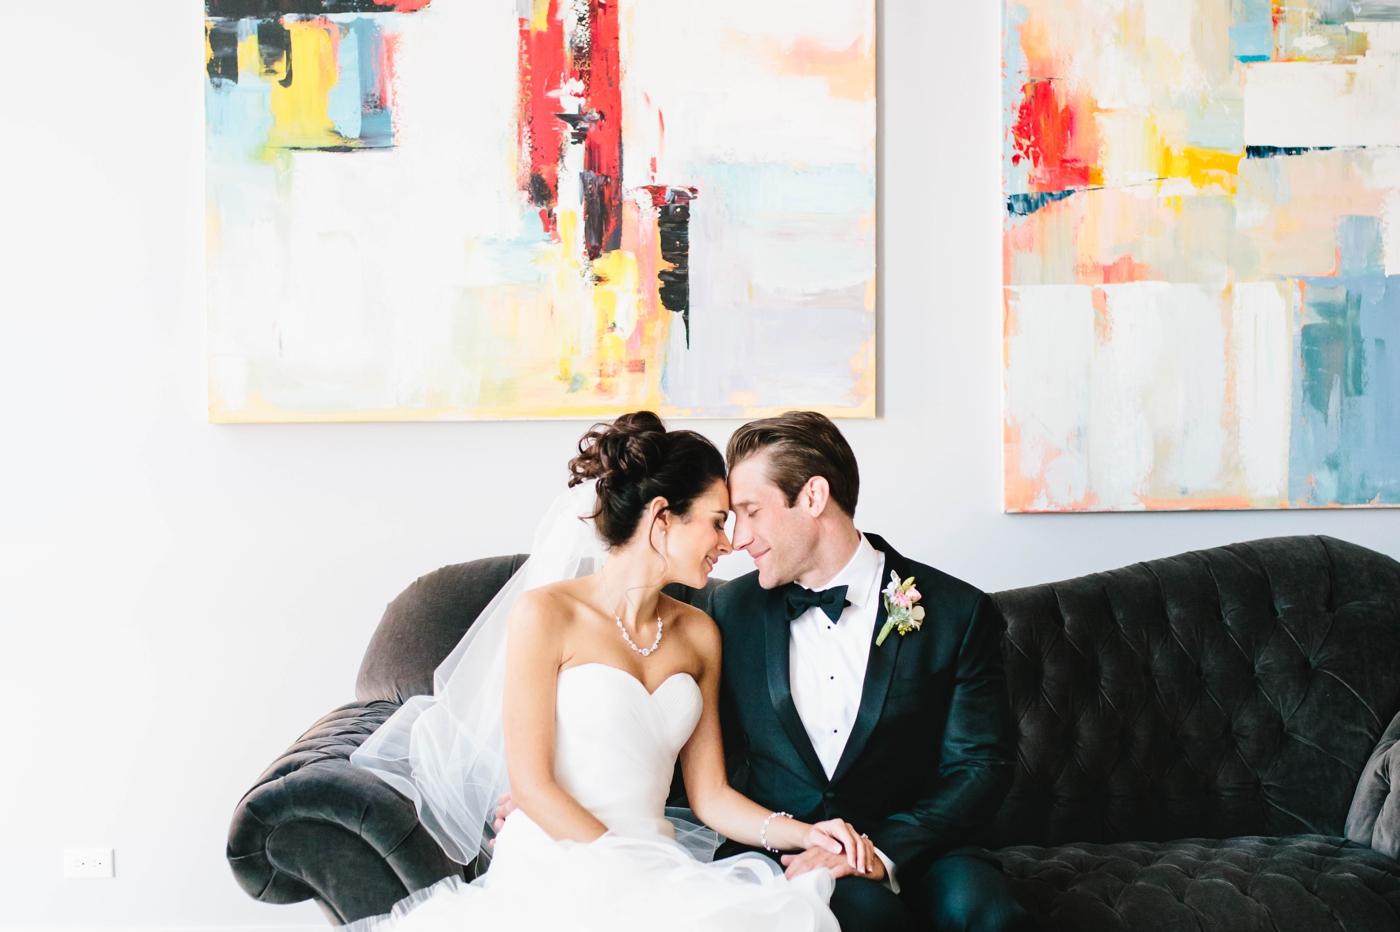 chicago-fine-art-wedding-photography-hamm22